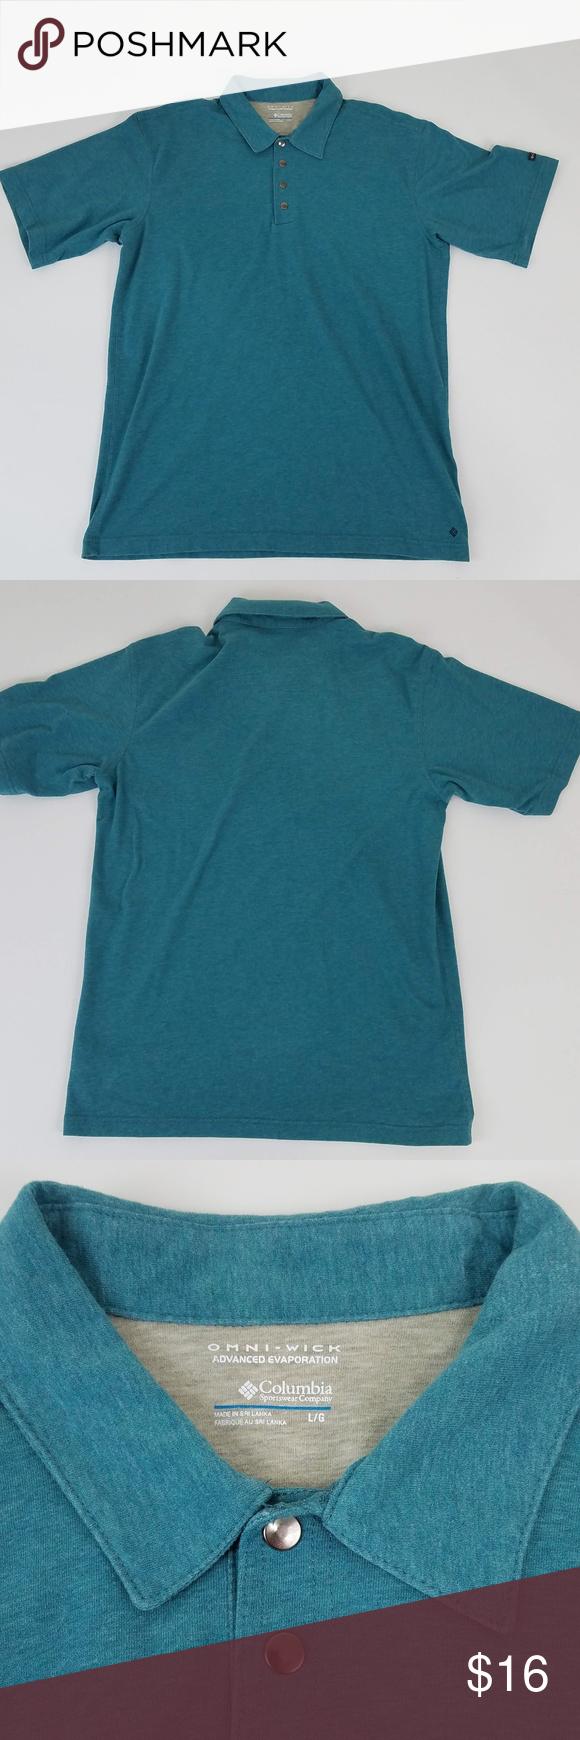 fb44b5e4d99 Columbia Men's Large Polo Shirt Omni-Wick Men's Columbia Omni-Wick  Turquoise 4 Snap Button Short Sleeve Polo. Logo on Sleeve. Size Large. Made  in Sri Lanka.